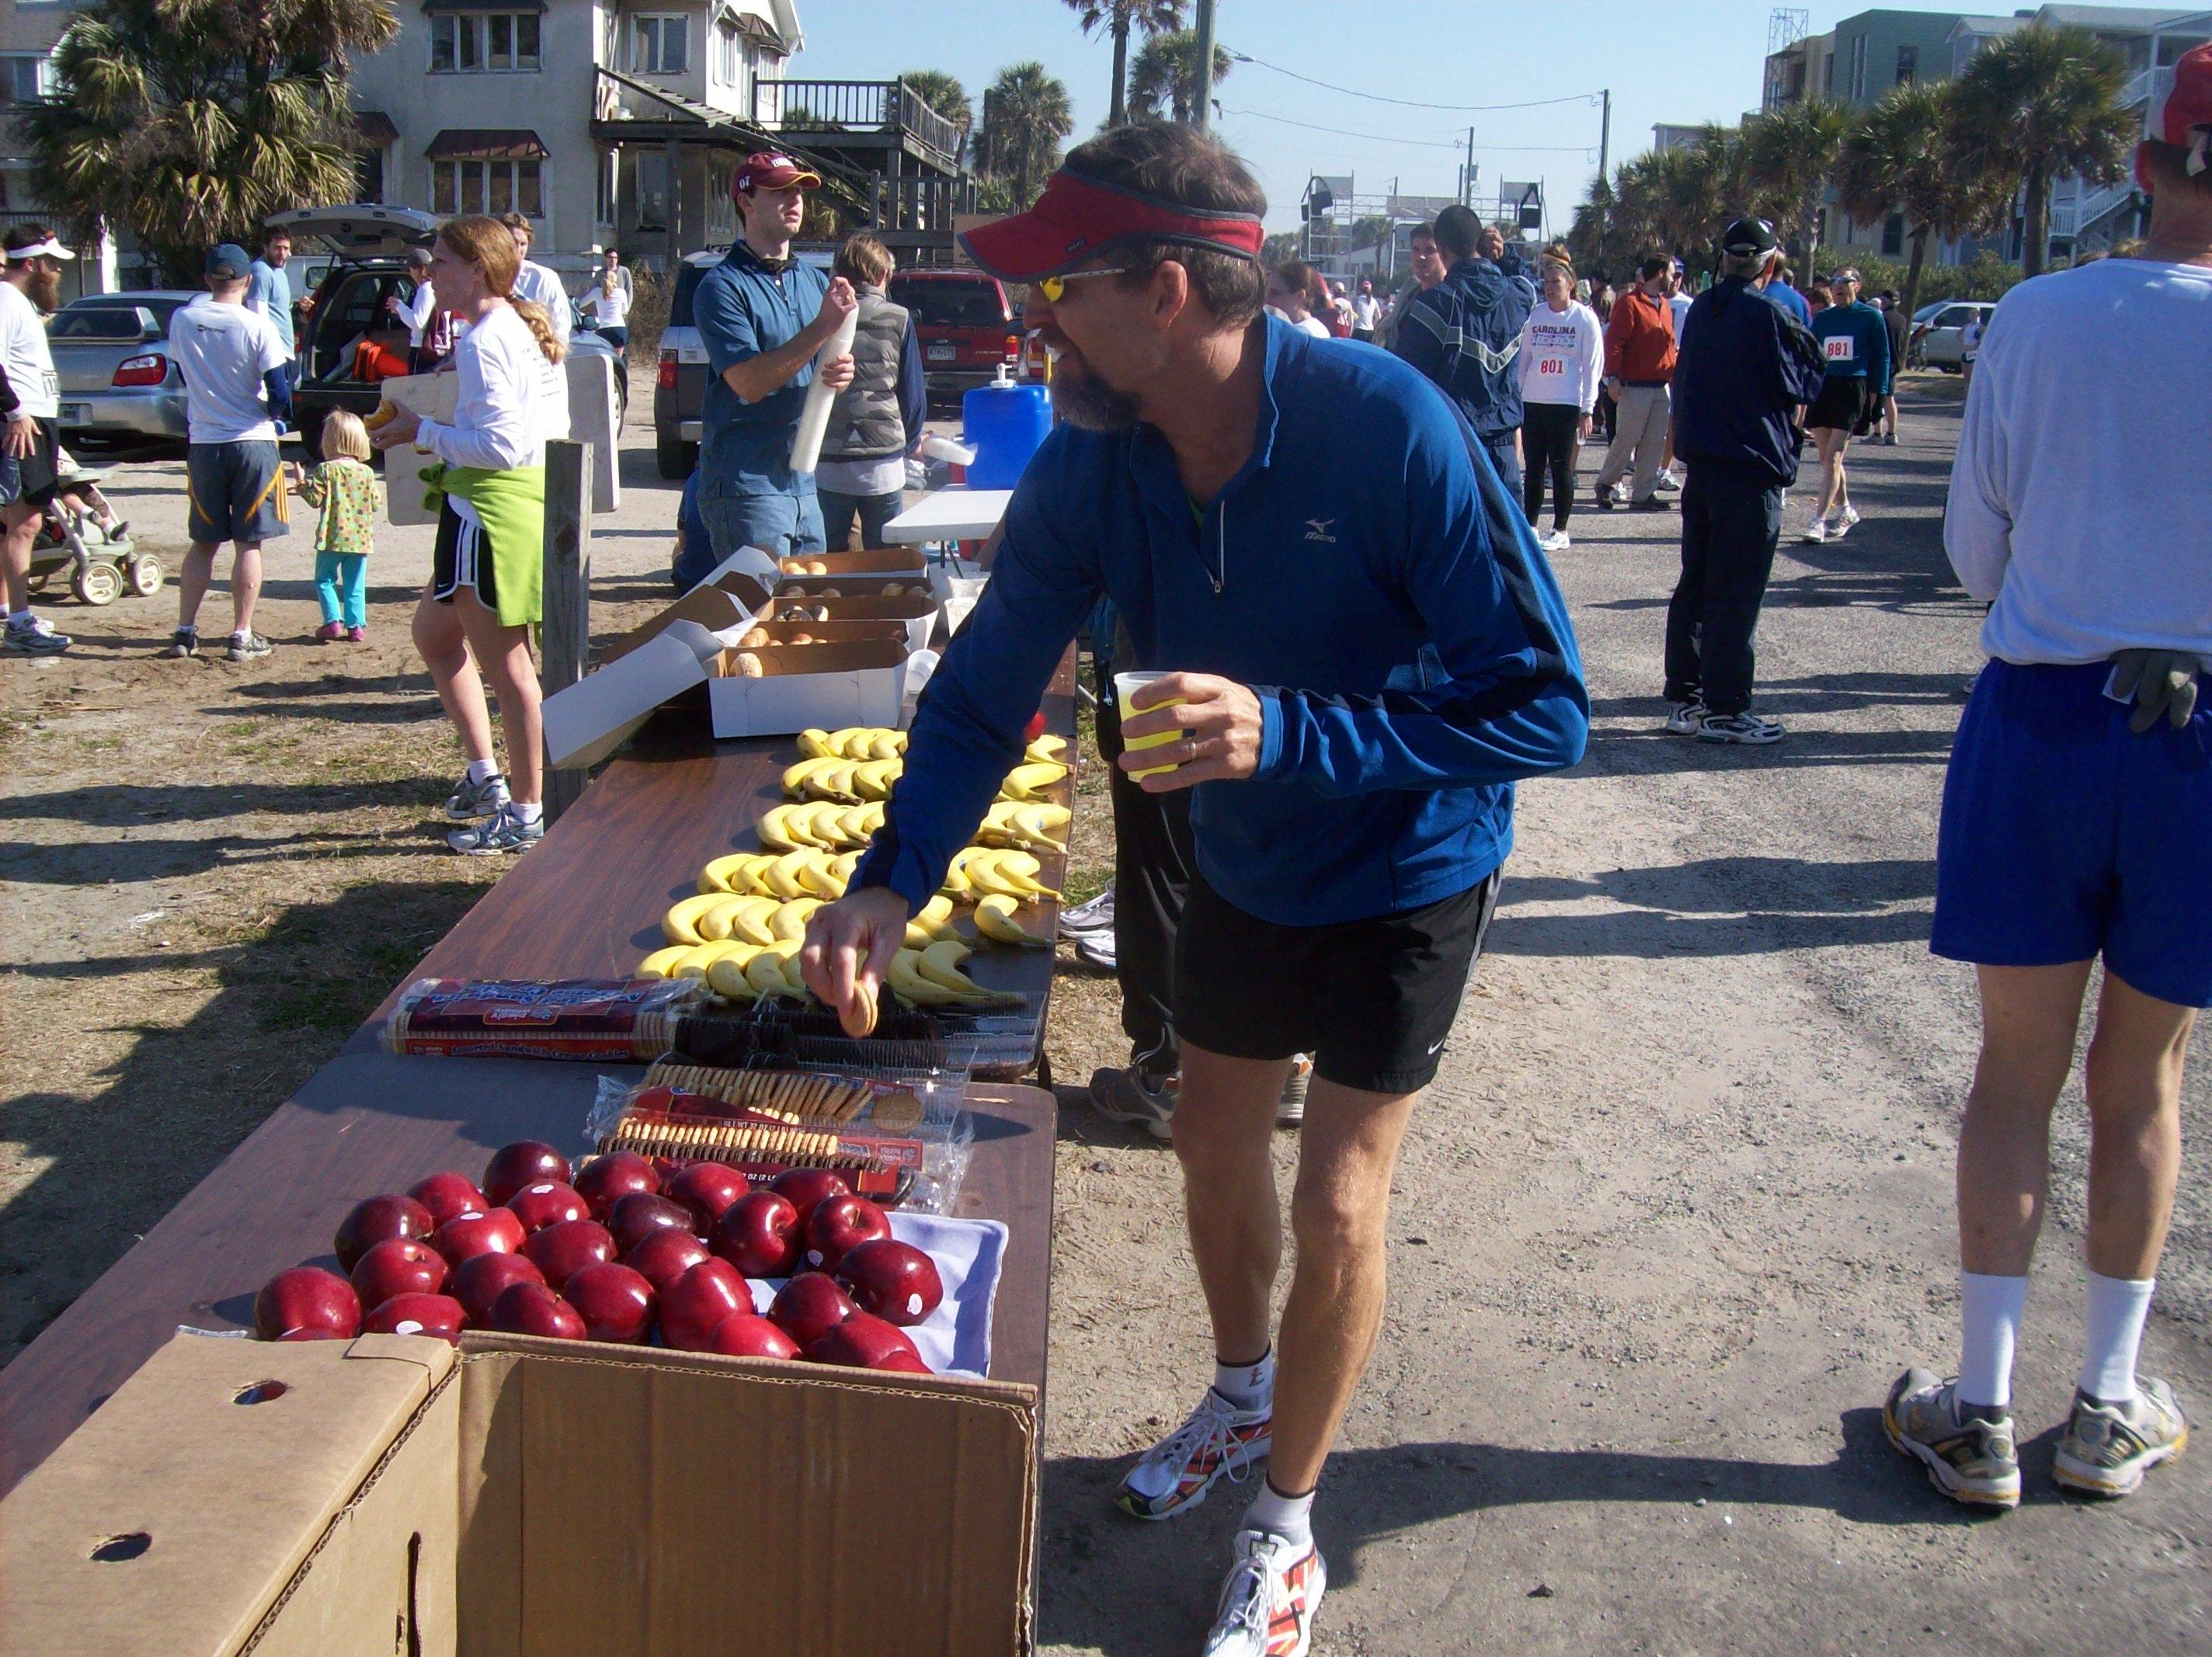 dieta maratona un mese prima